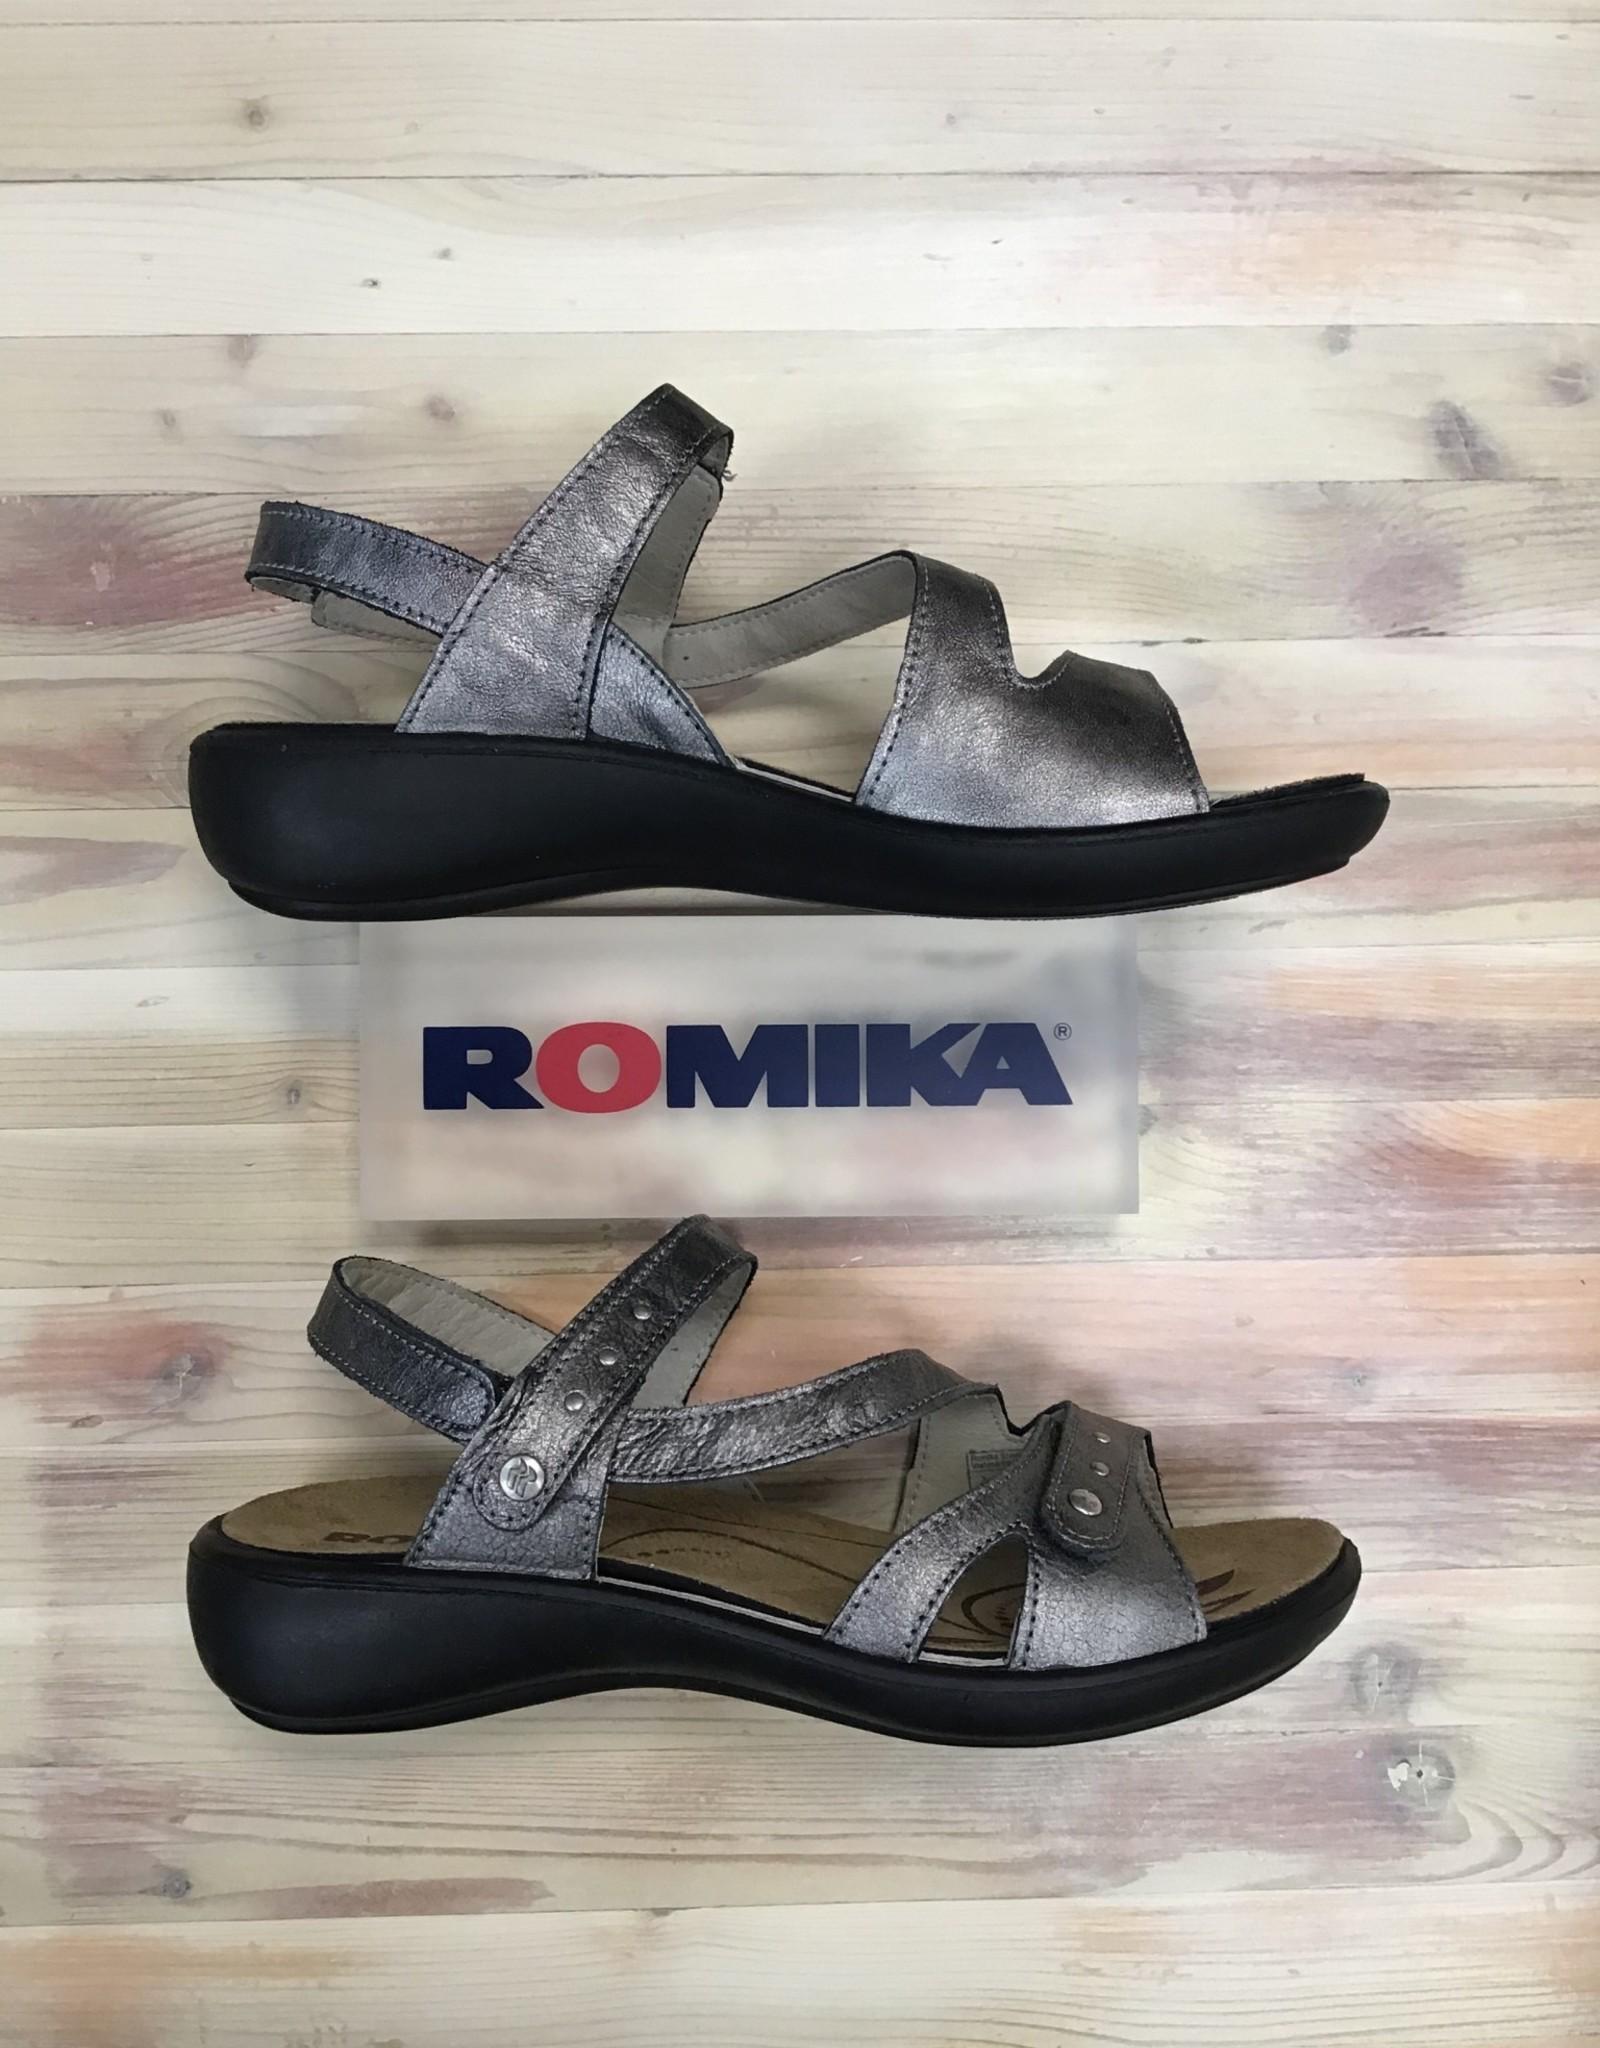 Romika Romika Ibiza 70 Ladies'